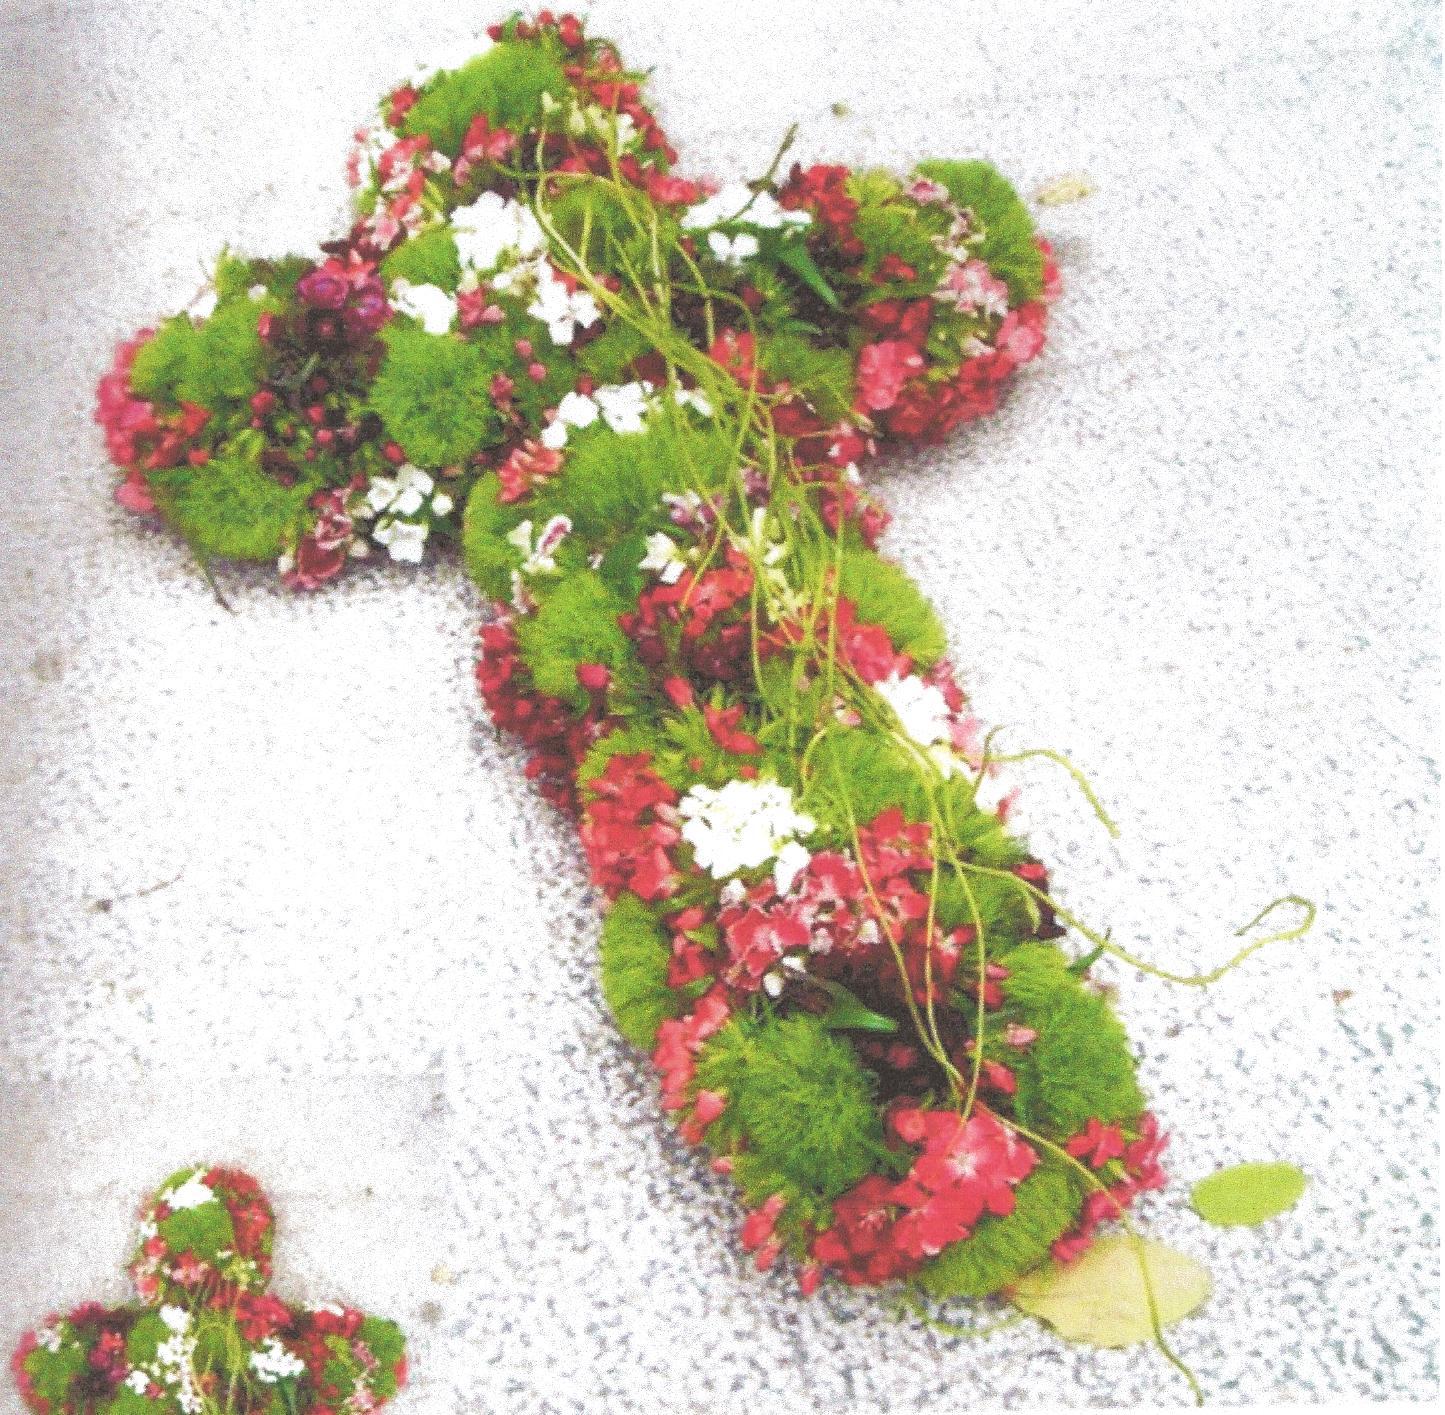 NR 12 kruisvorm met seizoensvulling 100 euro